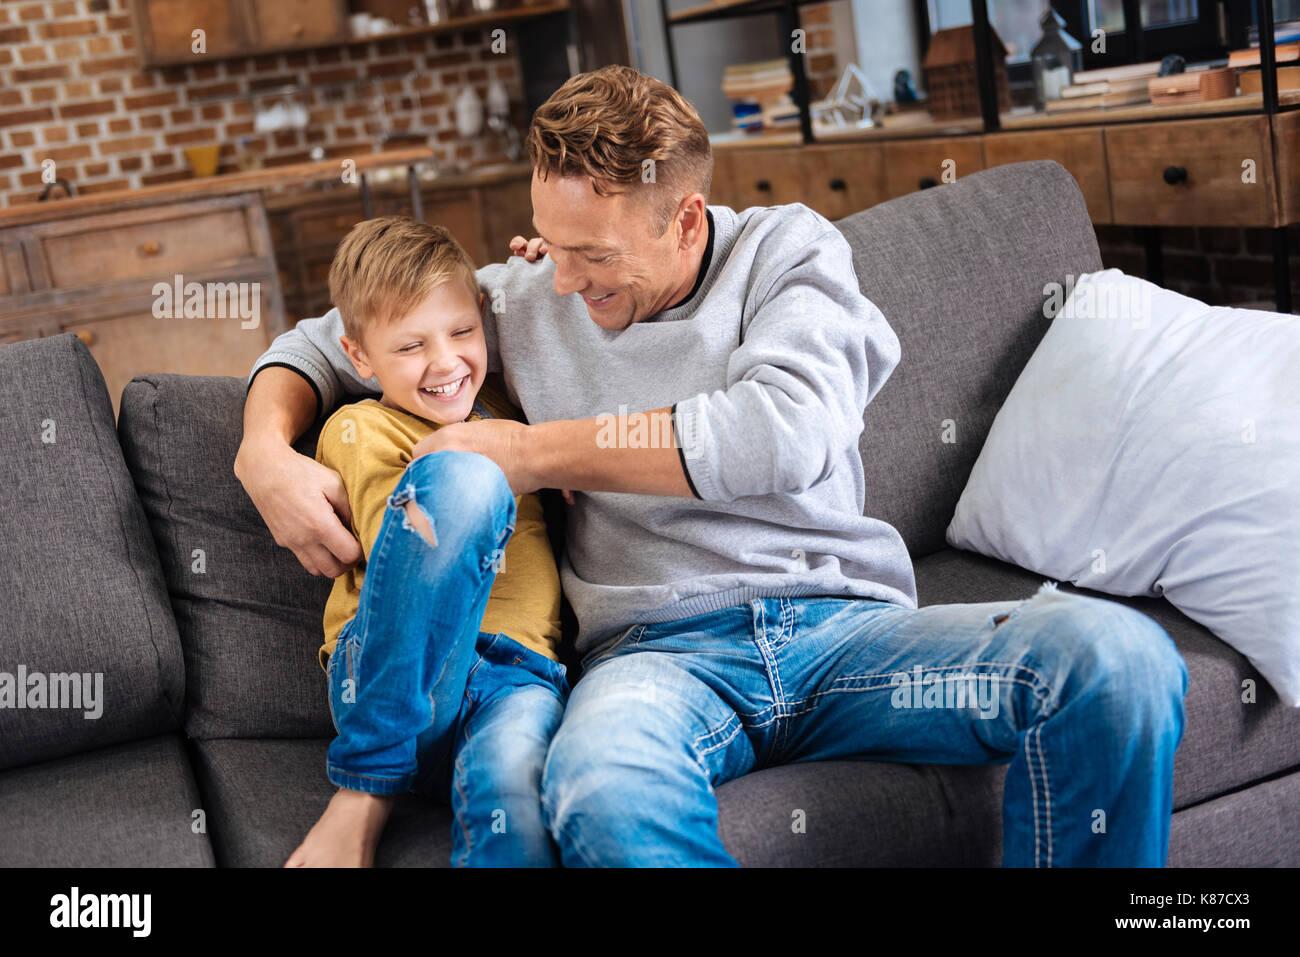 Liebevoller Vater kitzeln seinem kleinen Sohn auf dem Sofa Stockbild